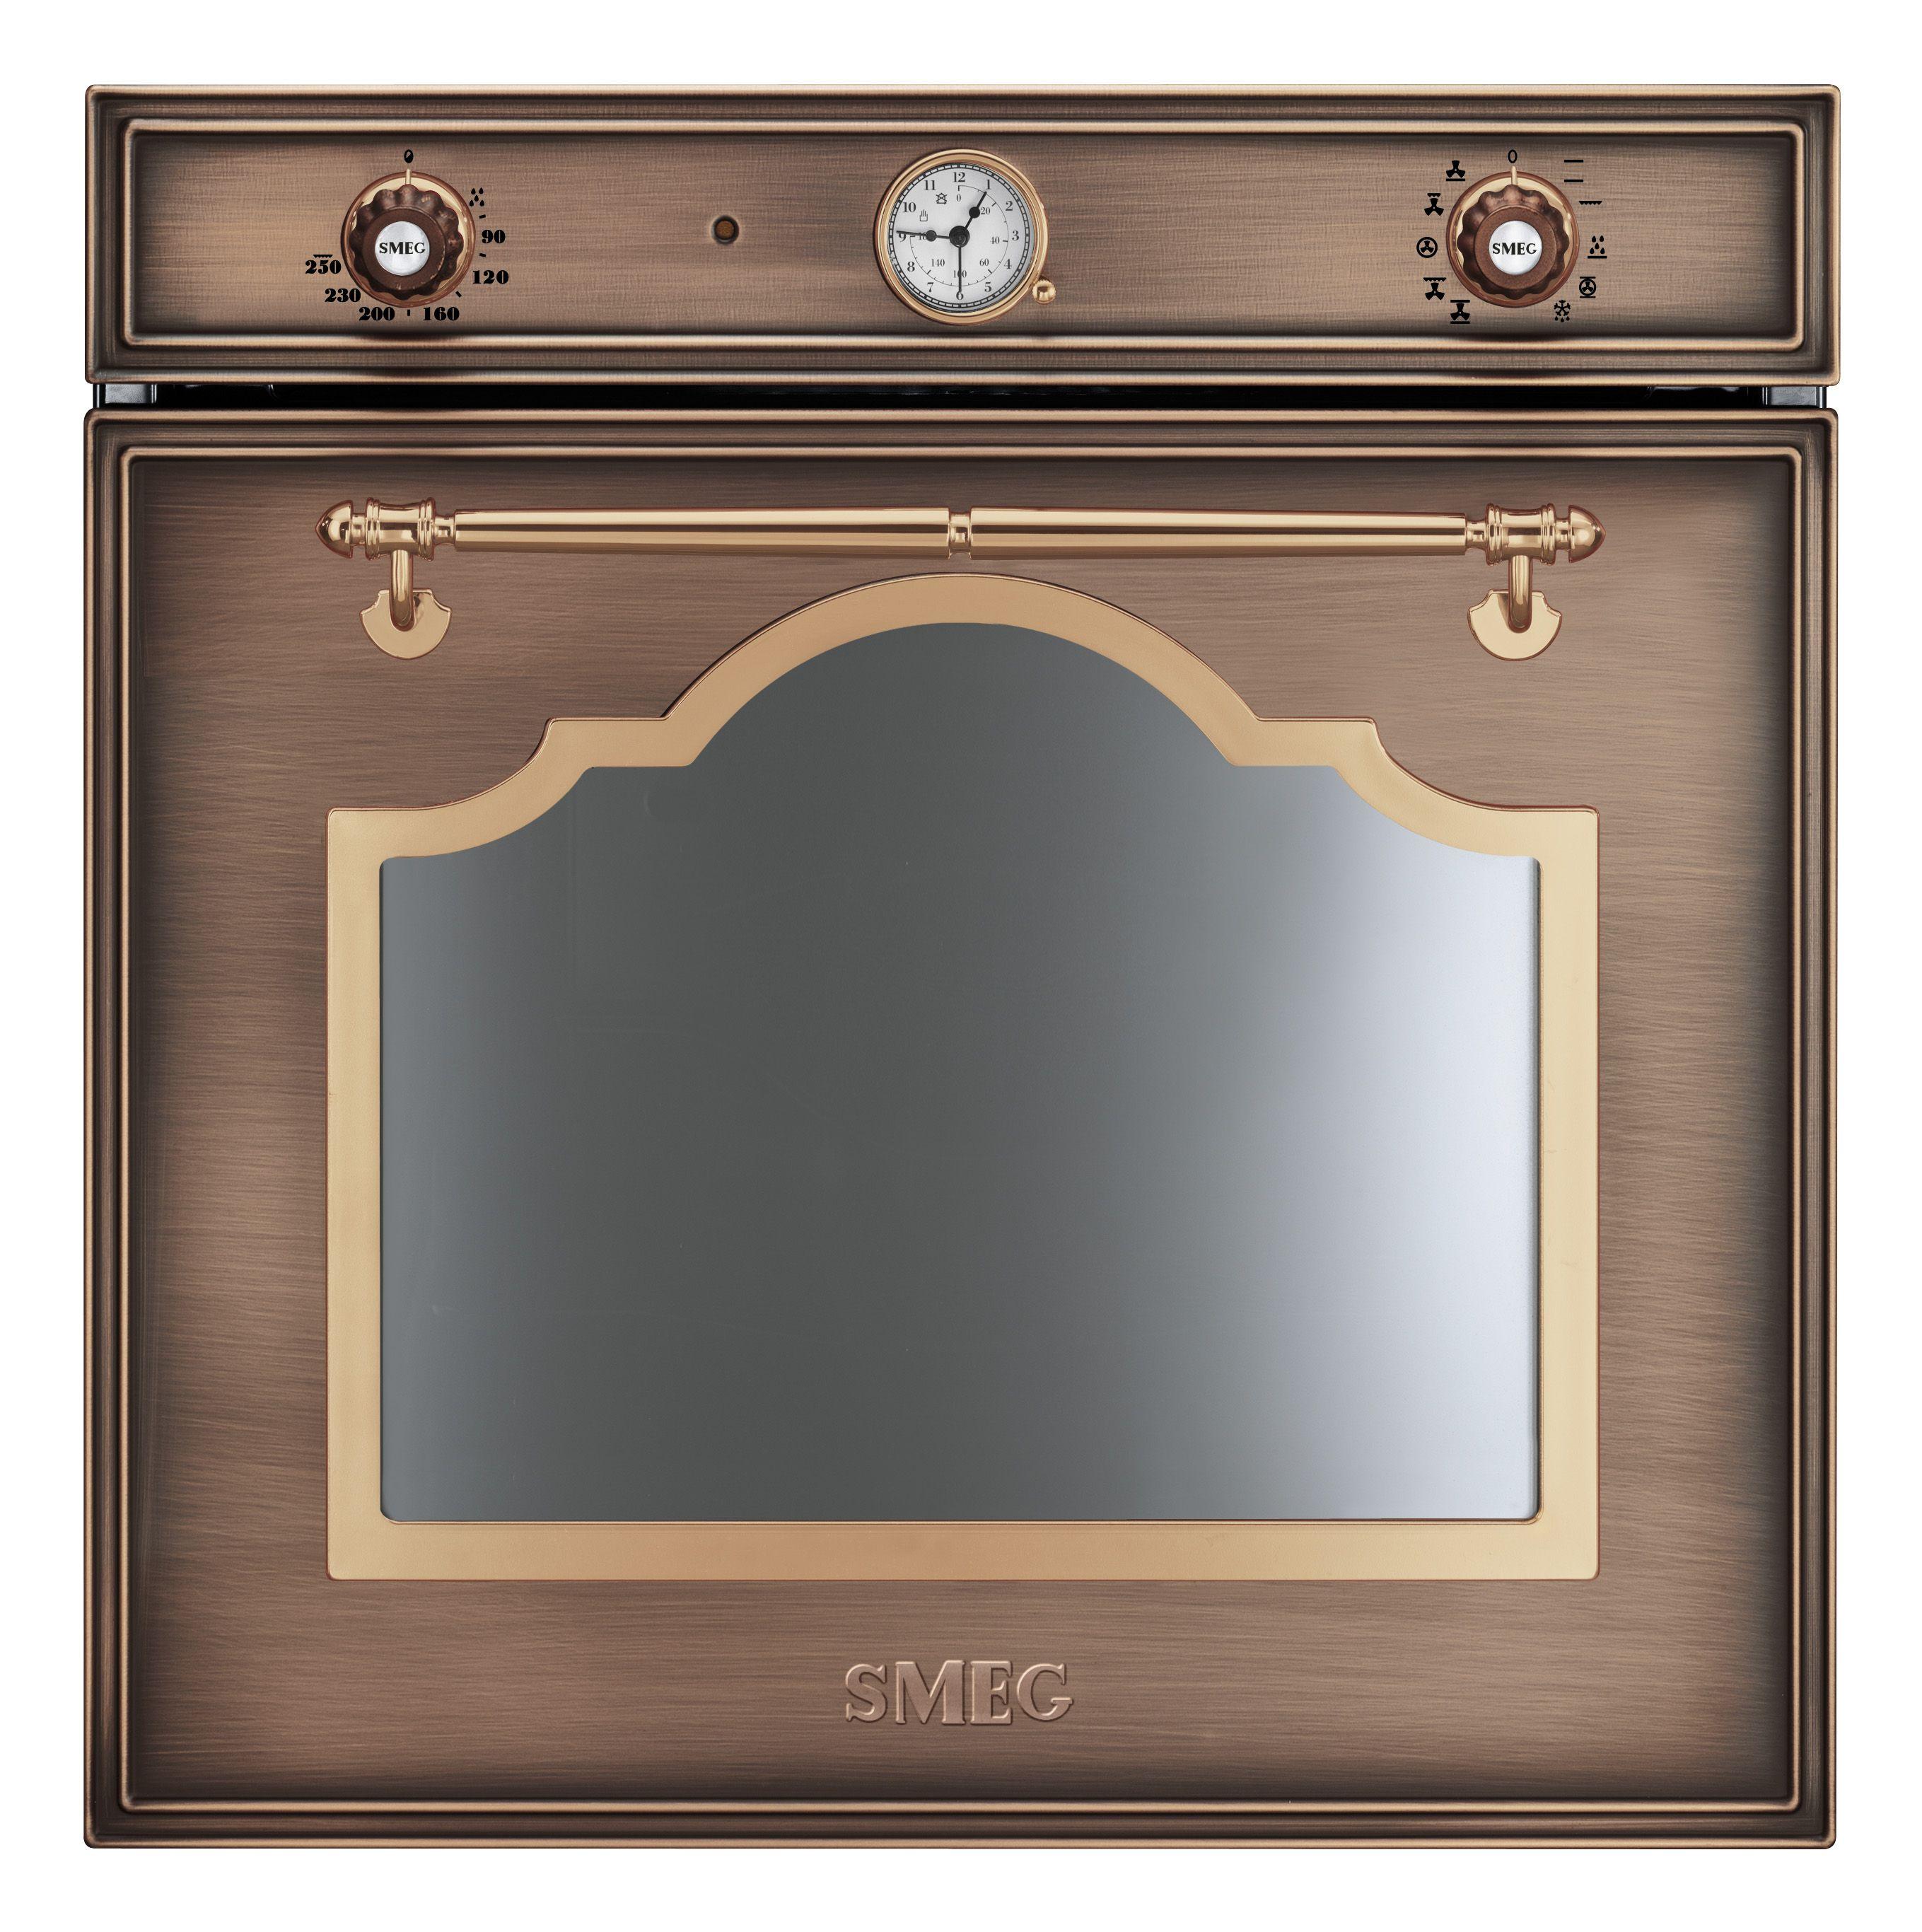 Copper Range Copper Kitchen Cooktops Ovens Ranges Kuche Ofen